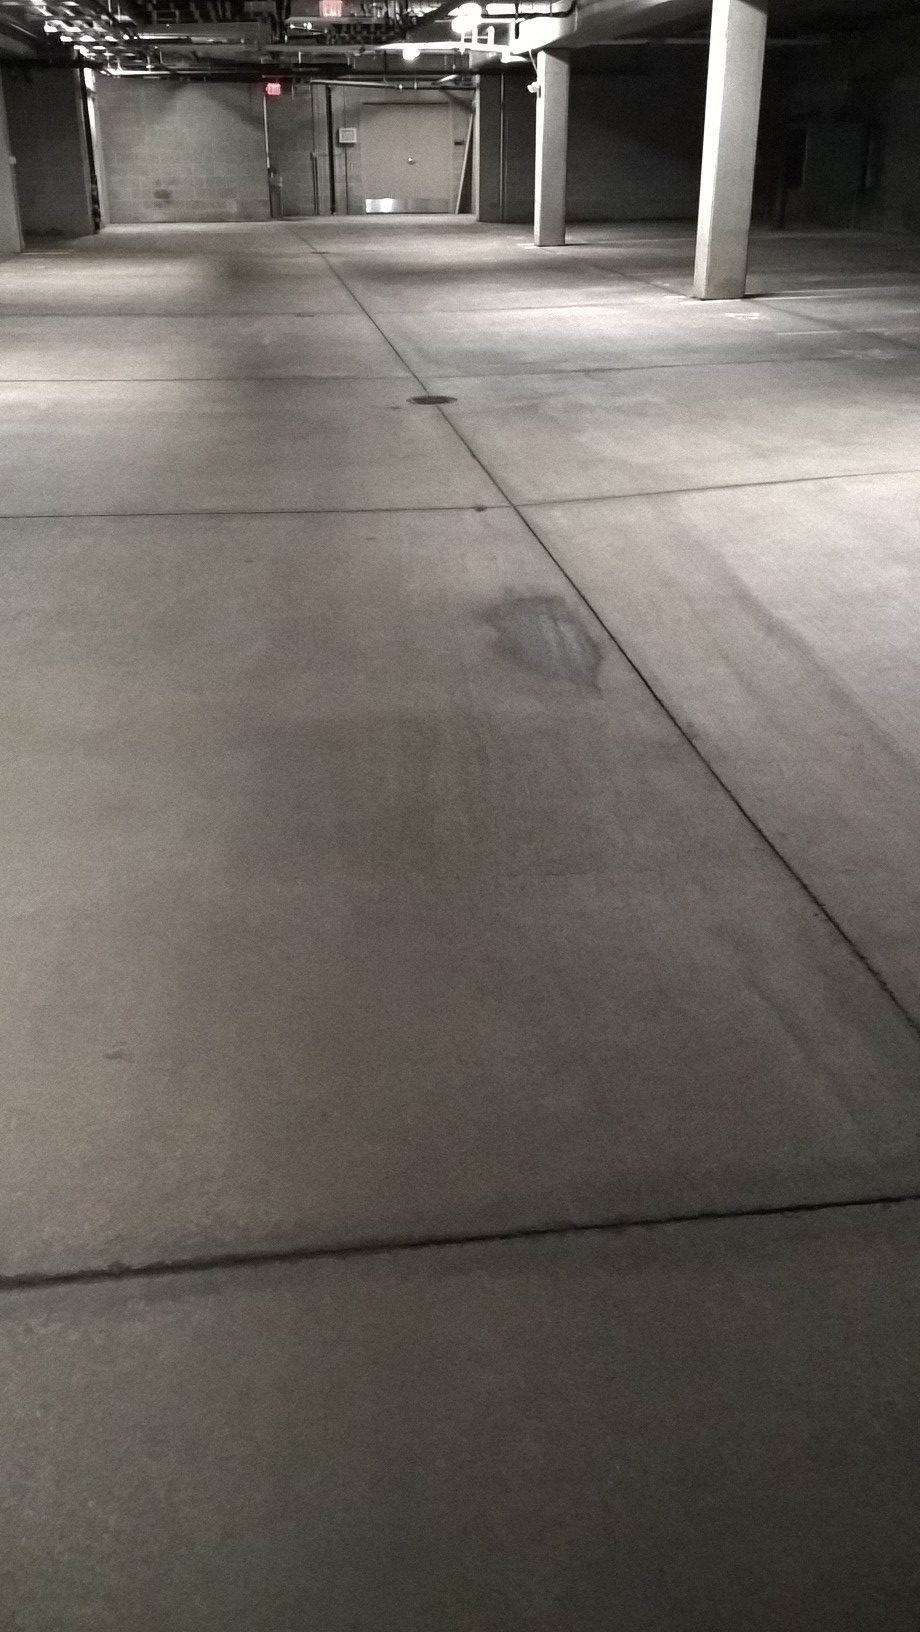 Parking Garage Pressure Washing Service in Minneapolis